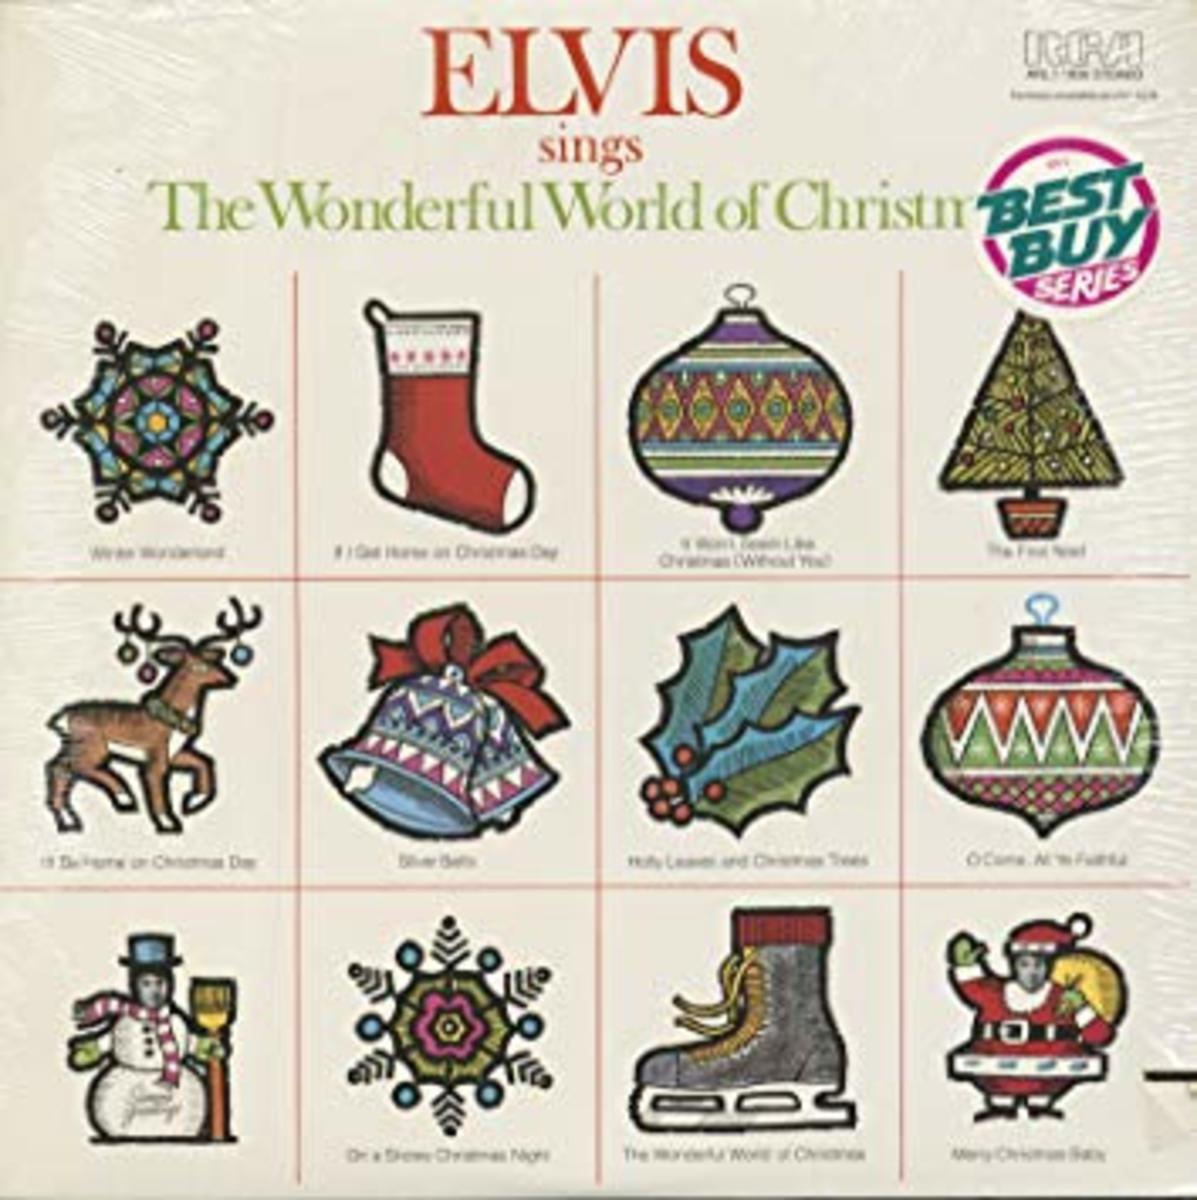 Elvis Presley—The Wonderful World of Christmas